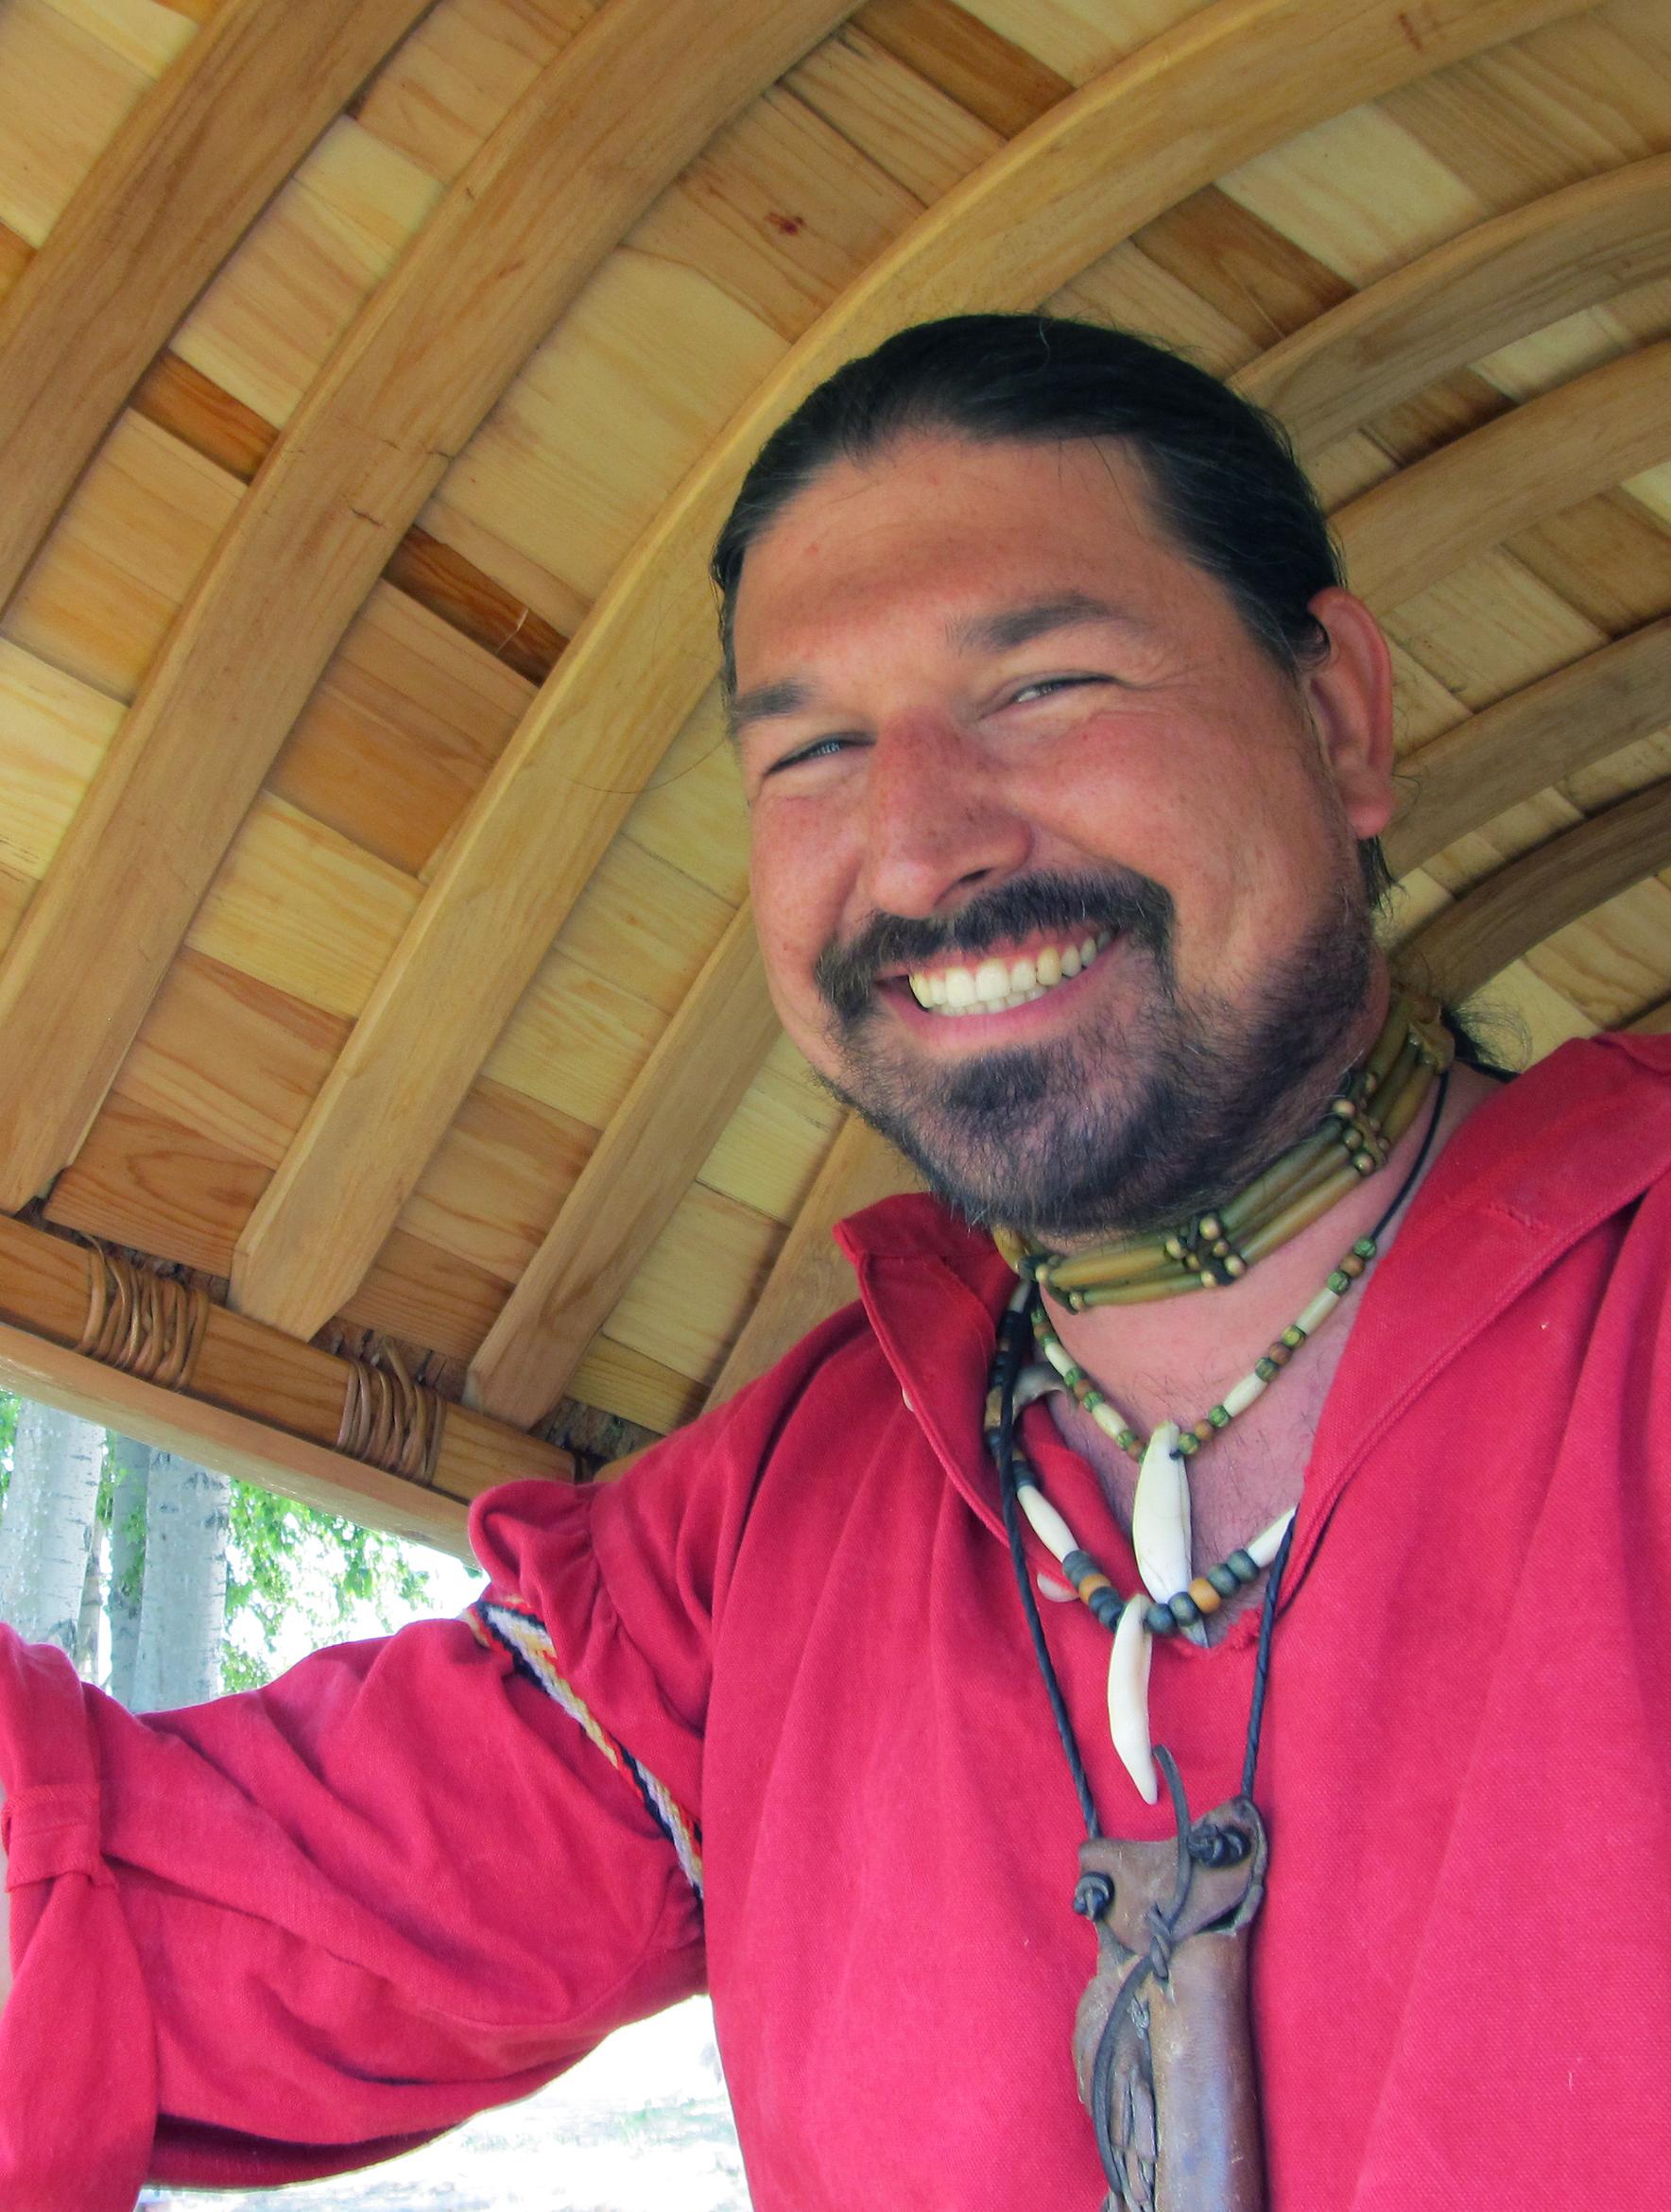 Christian Pilon, great adventurer, ambassador of the Coureurs des bois Challenge